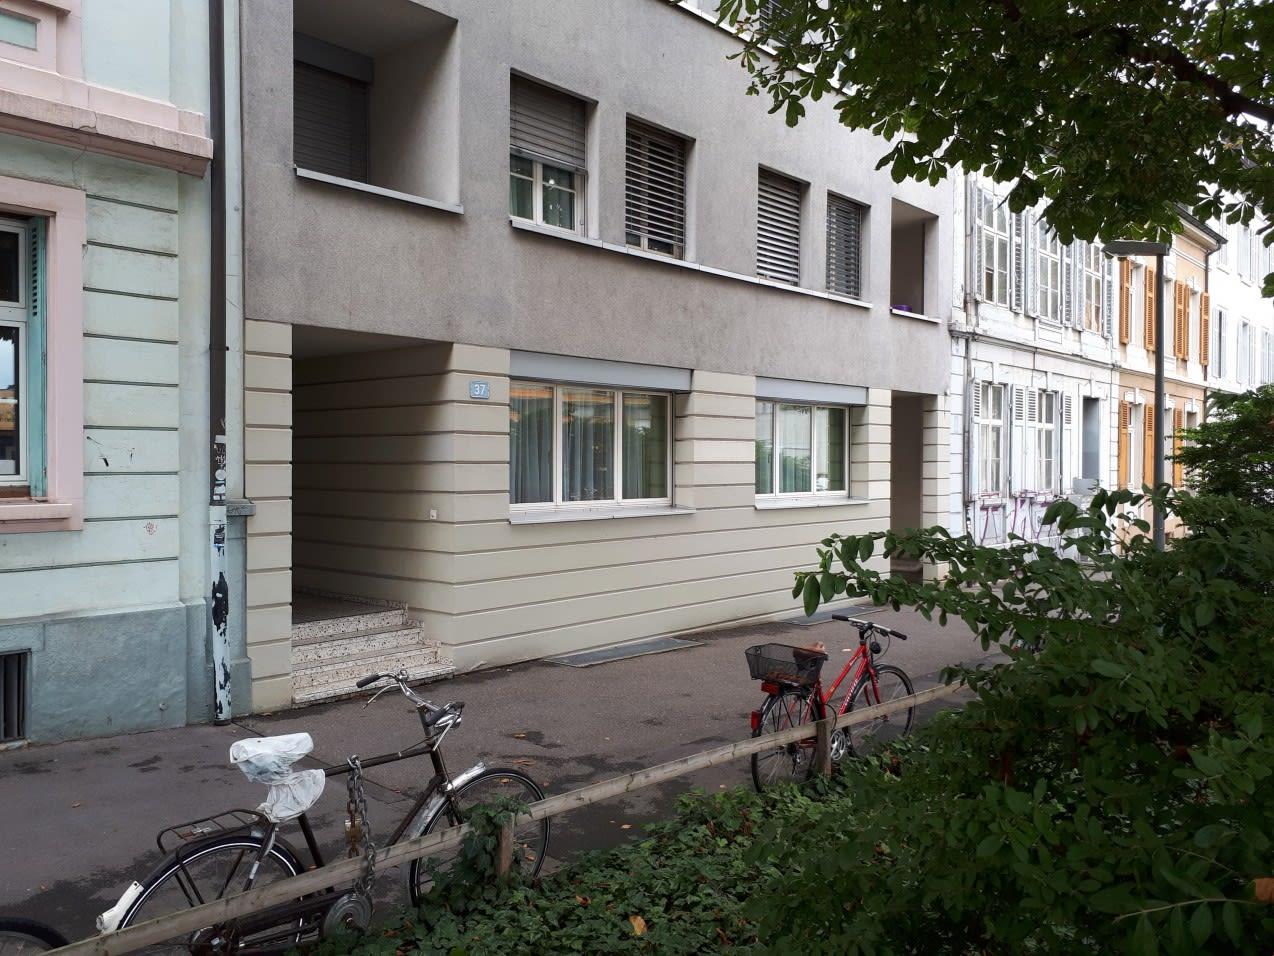 Klingelbergstrasse 37